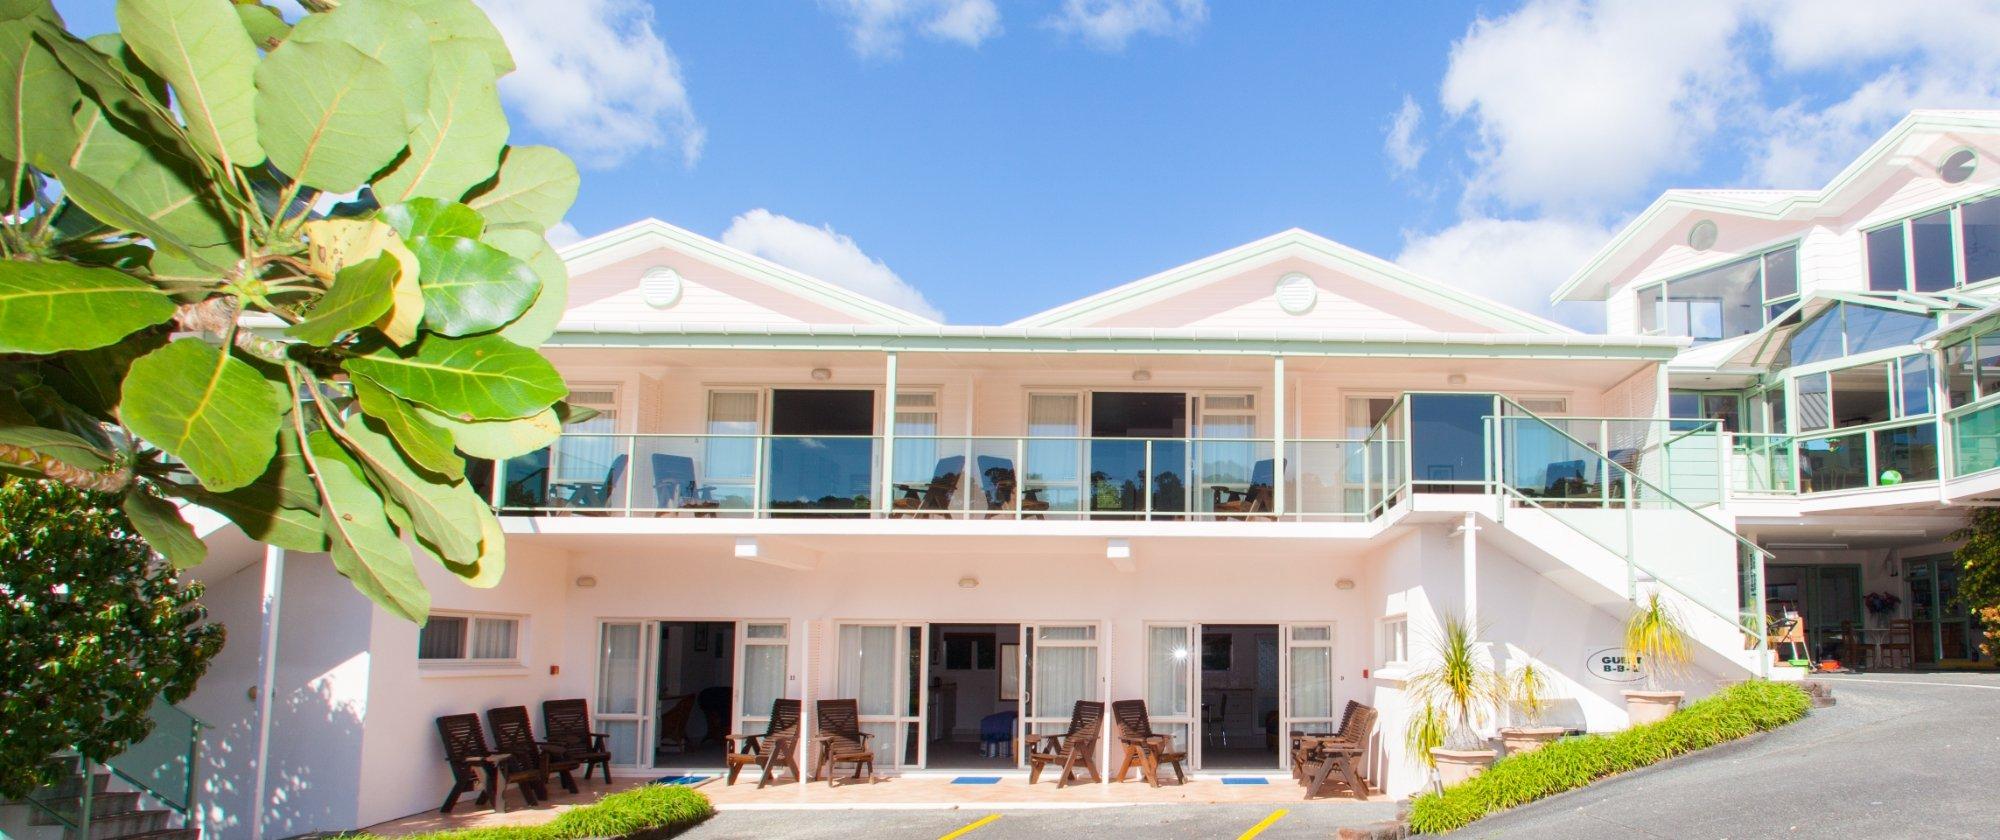 Admiral's View Lodge & Motel